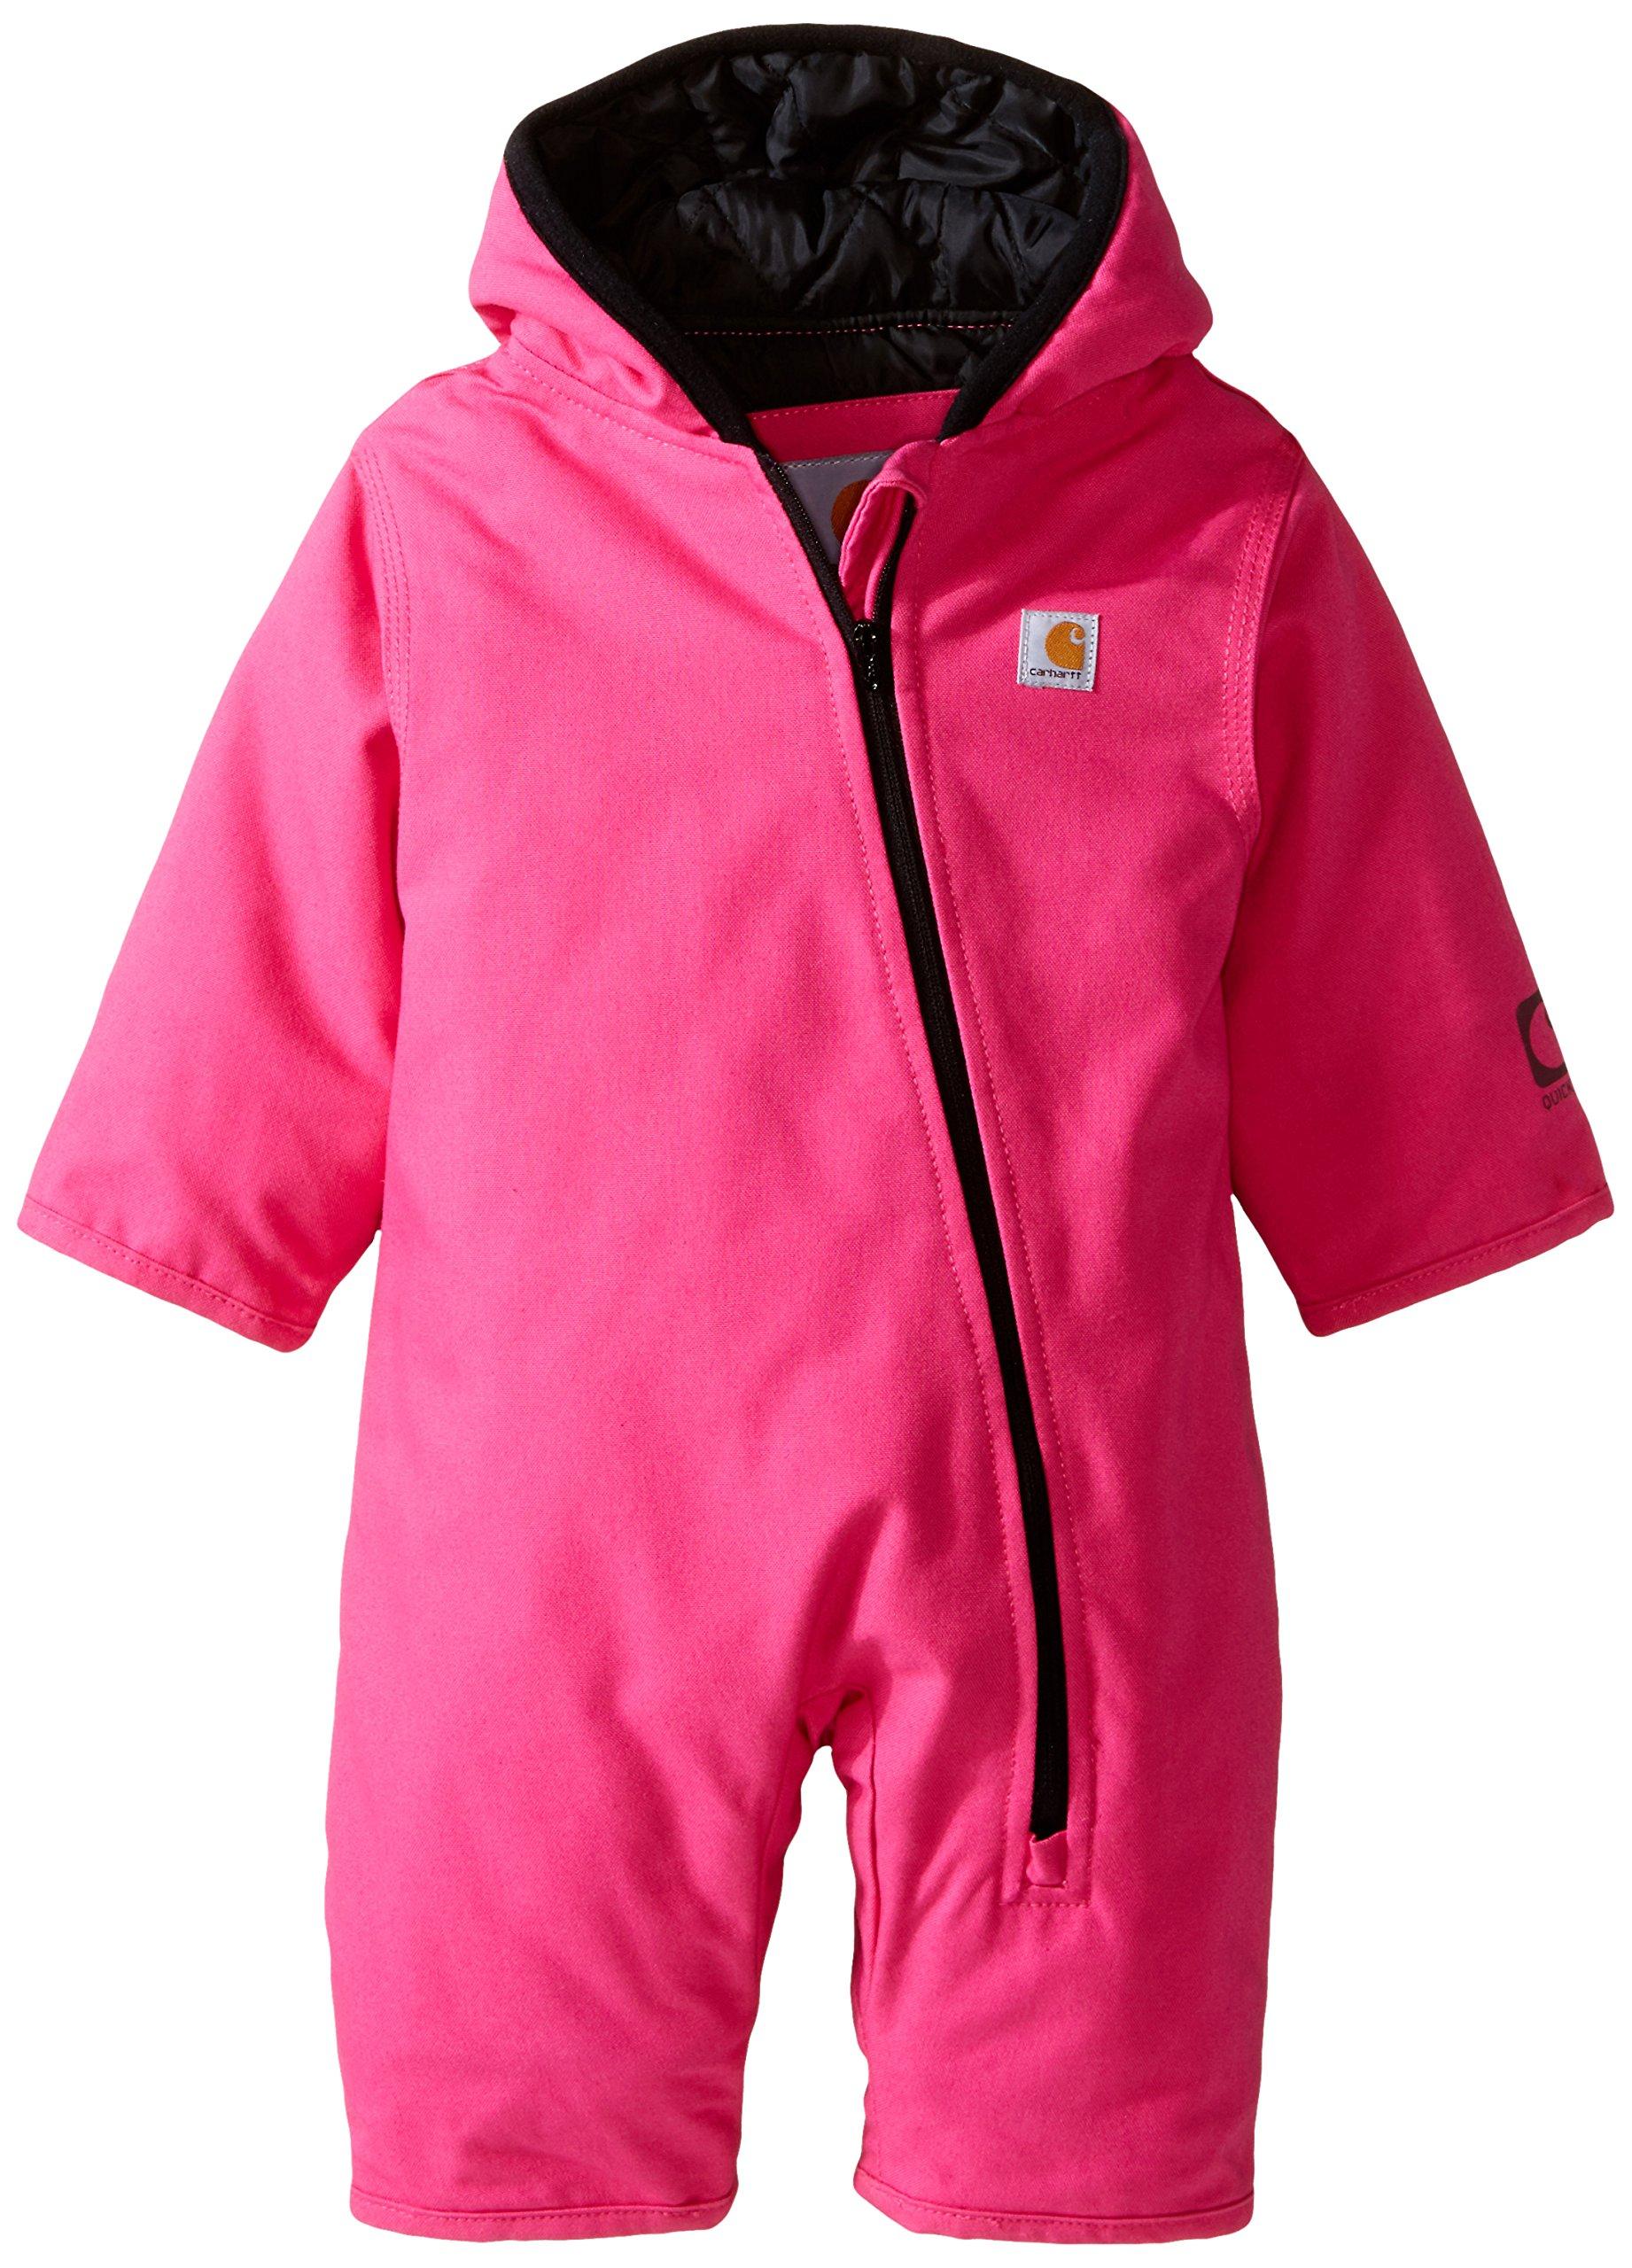 Carhartt Baby Girls' Quick Duck Snowsuit Taff Lined, Pink, 6 Months by Carhartt